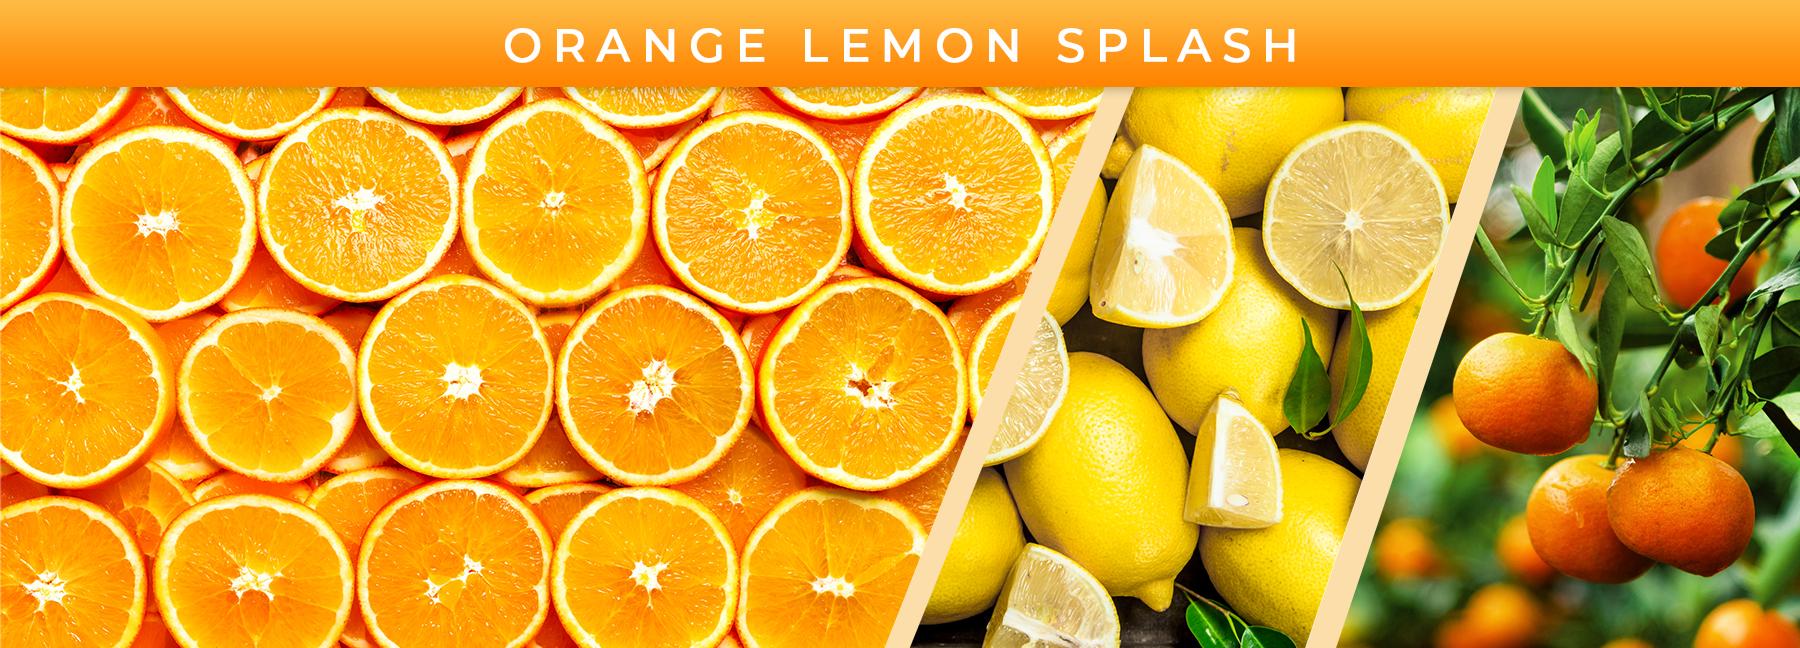 Orange Lemon Splash fragrance elements